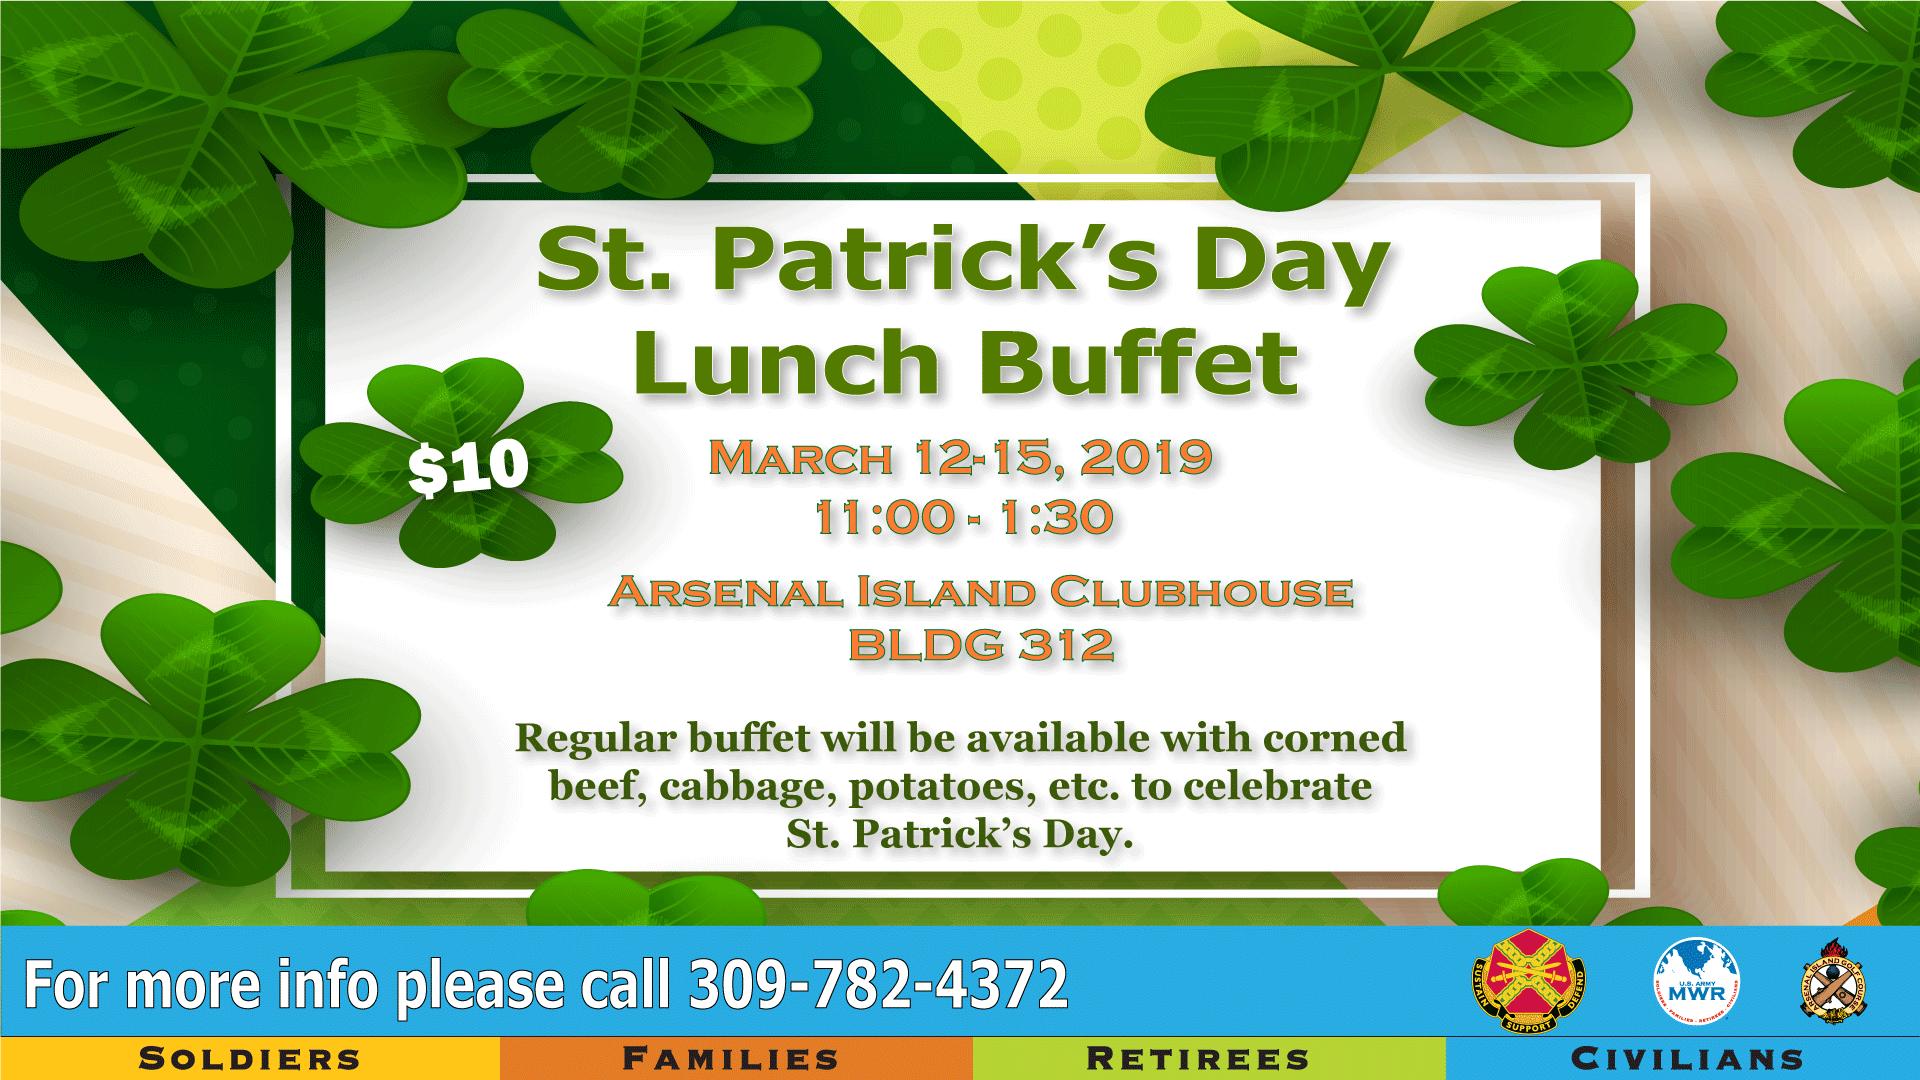 St. Patrick's Day Buffet